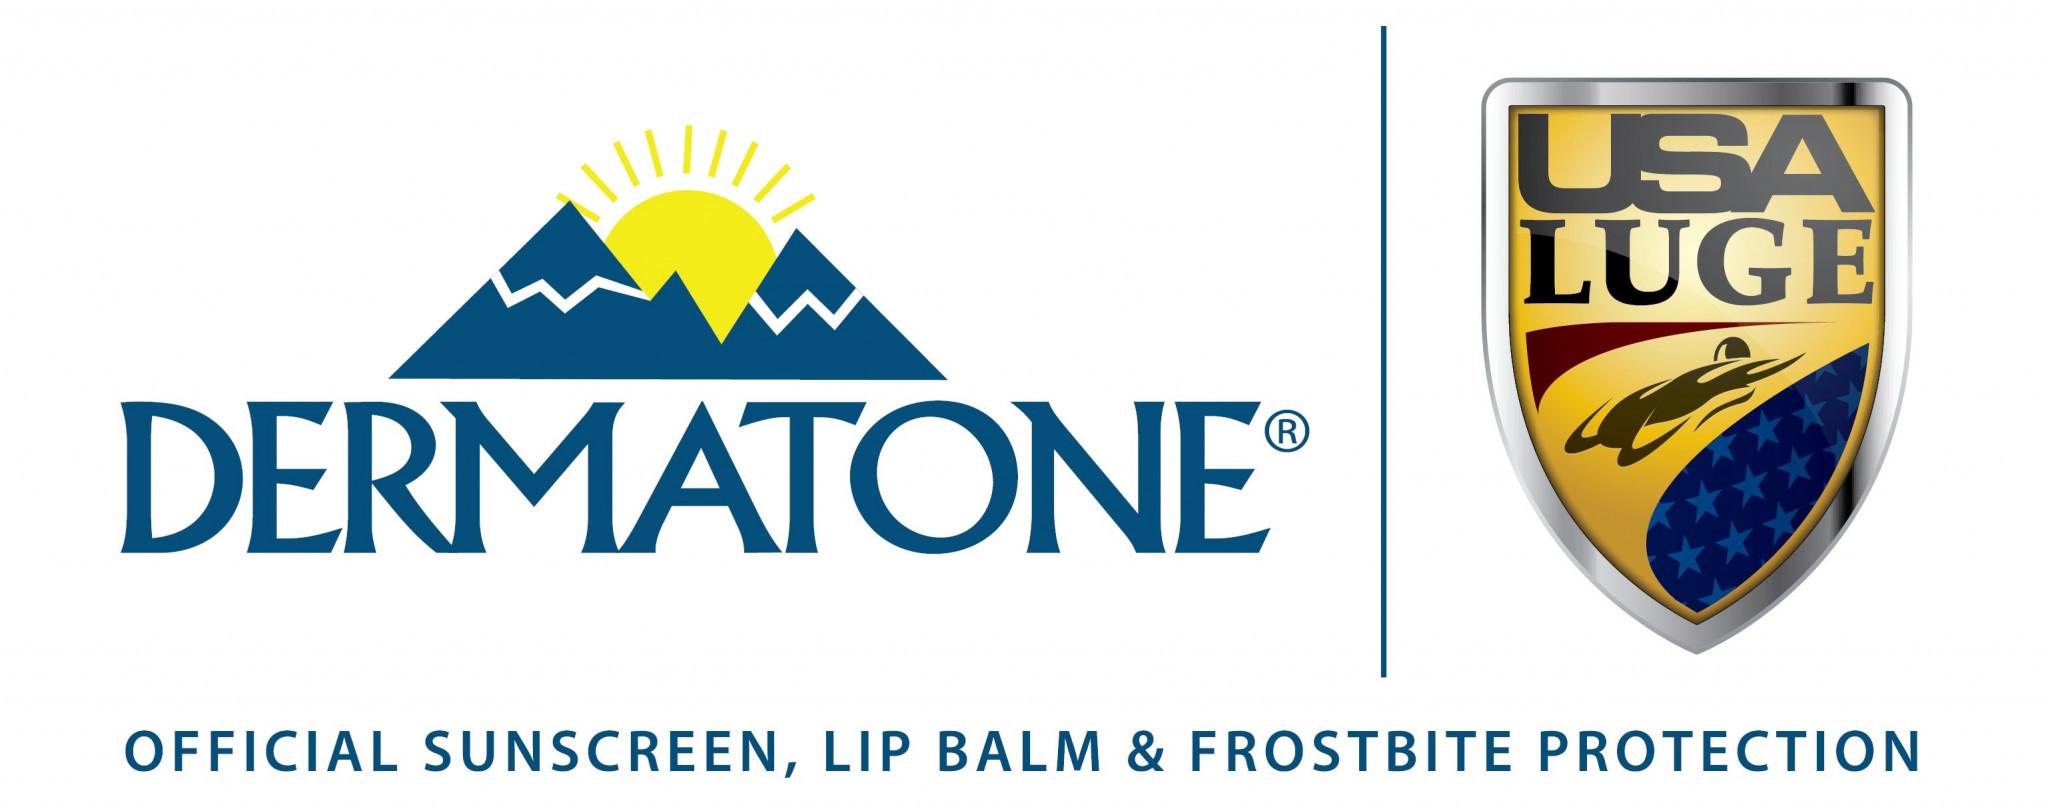 USA Luge secures partnership with skincare company Dermatone